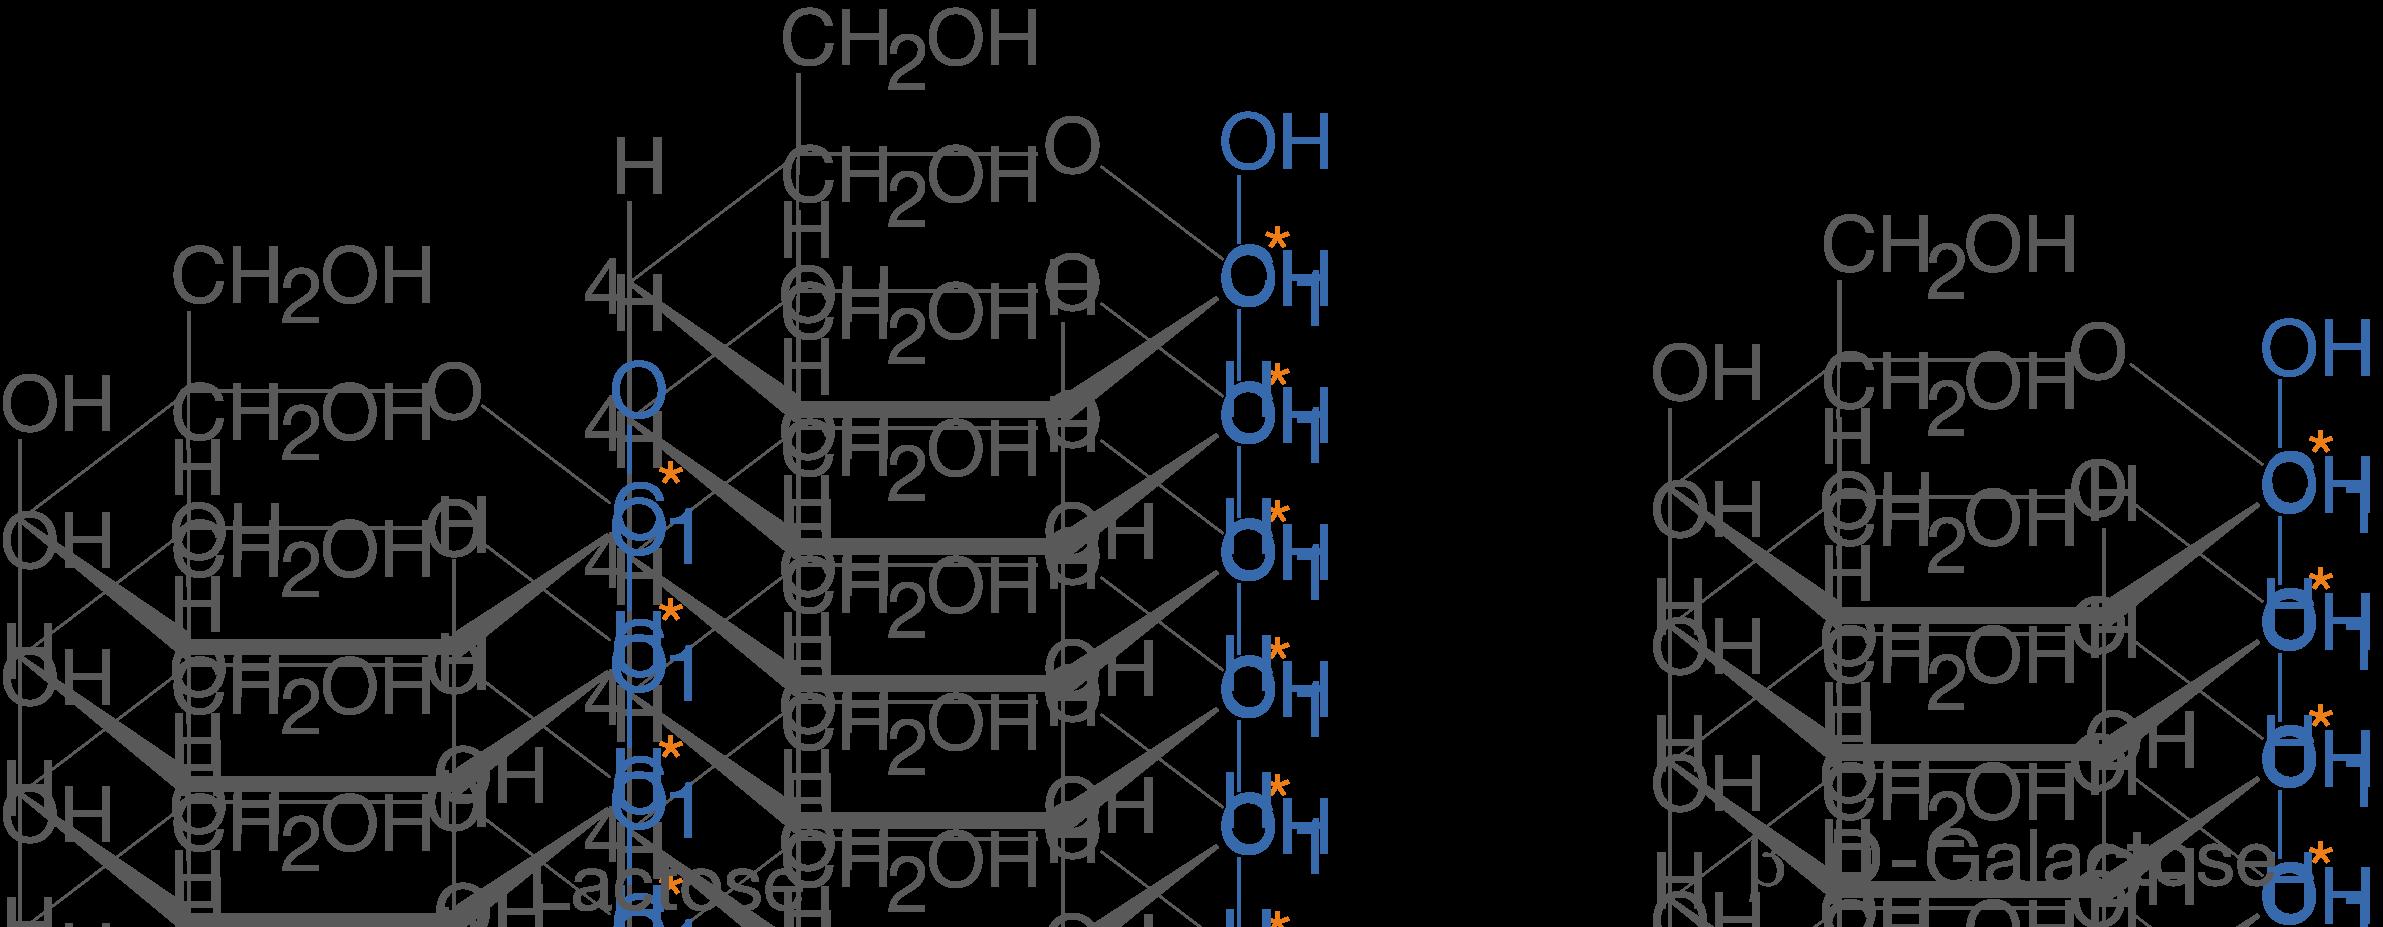 Disaccharide Naturstoffe Chemie Digitales Schulbuch Skripte